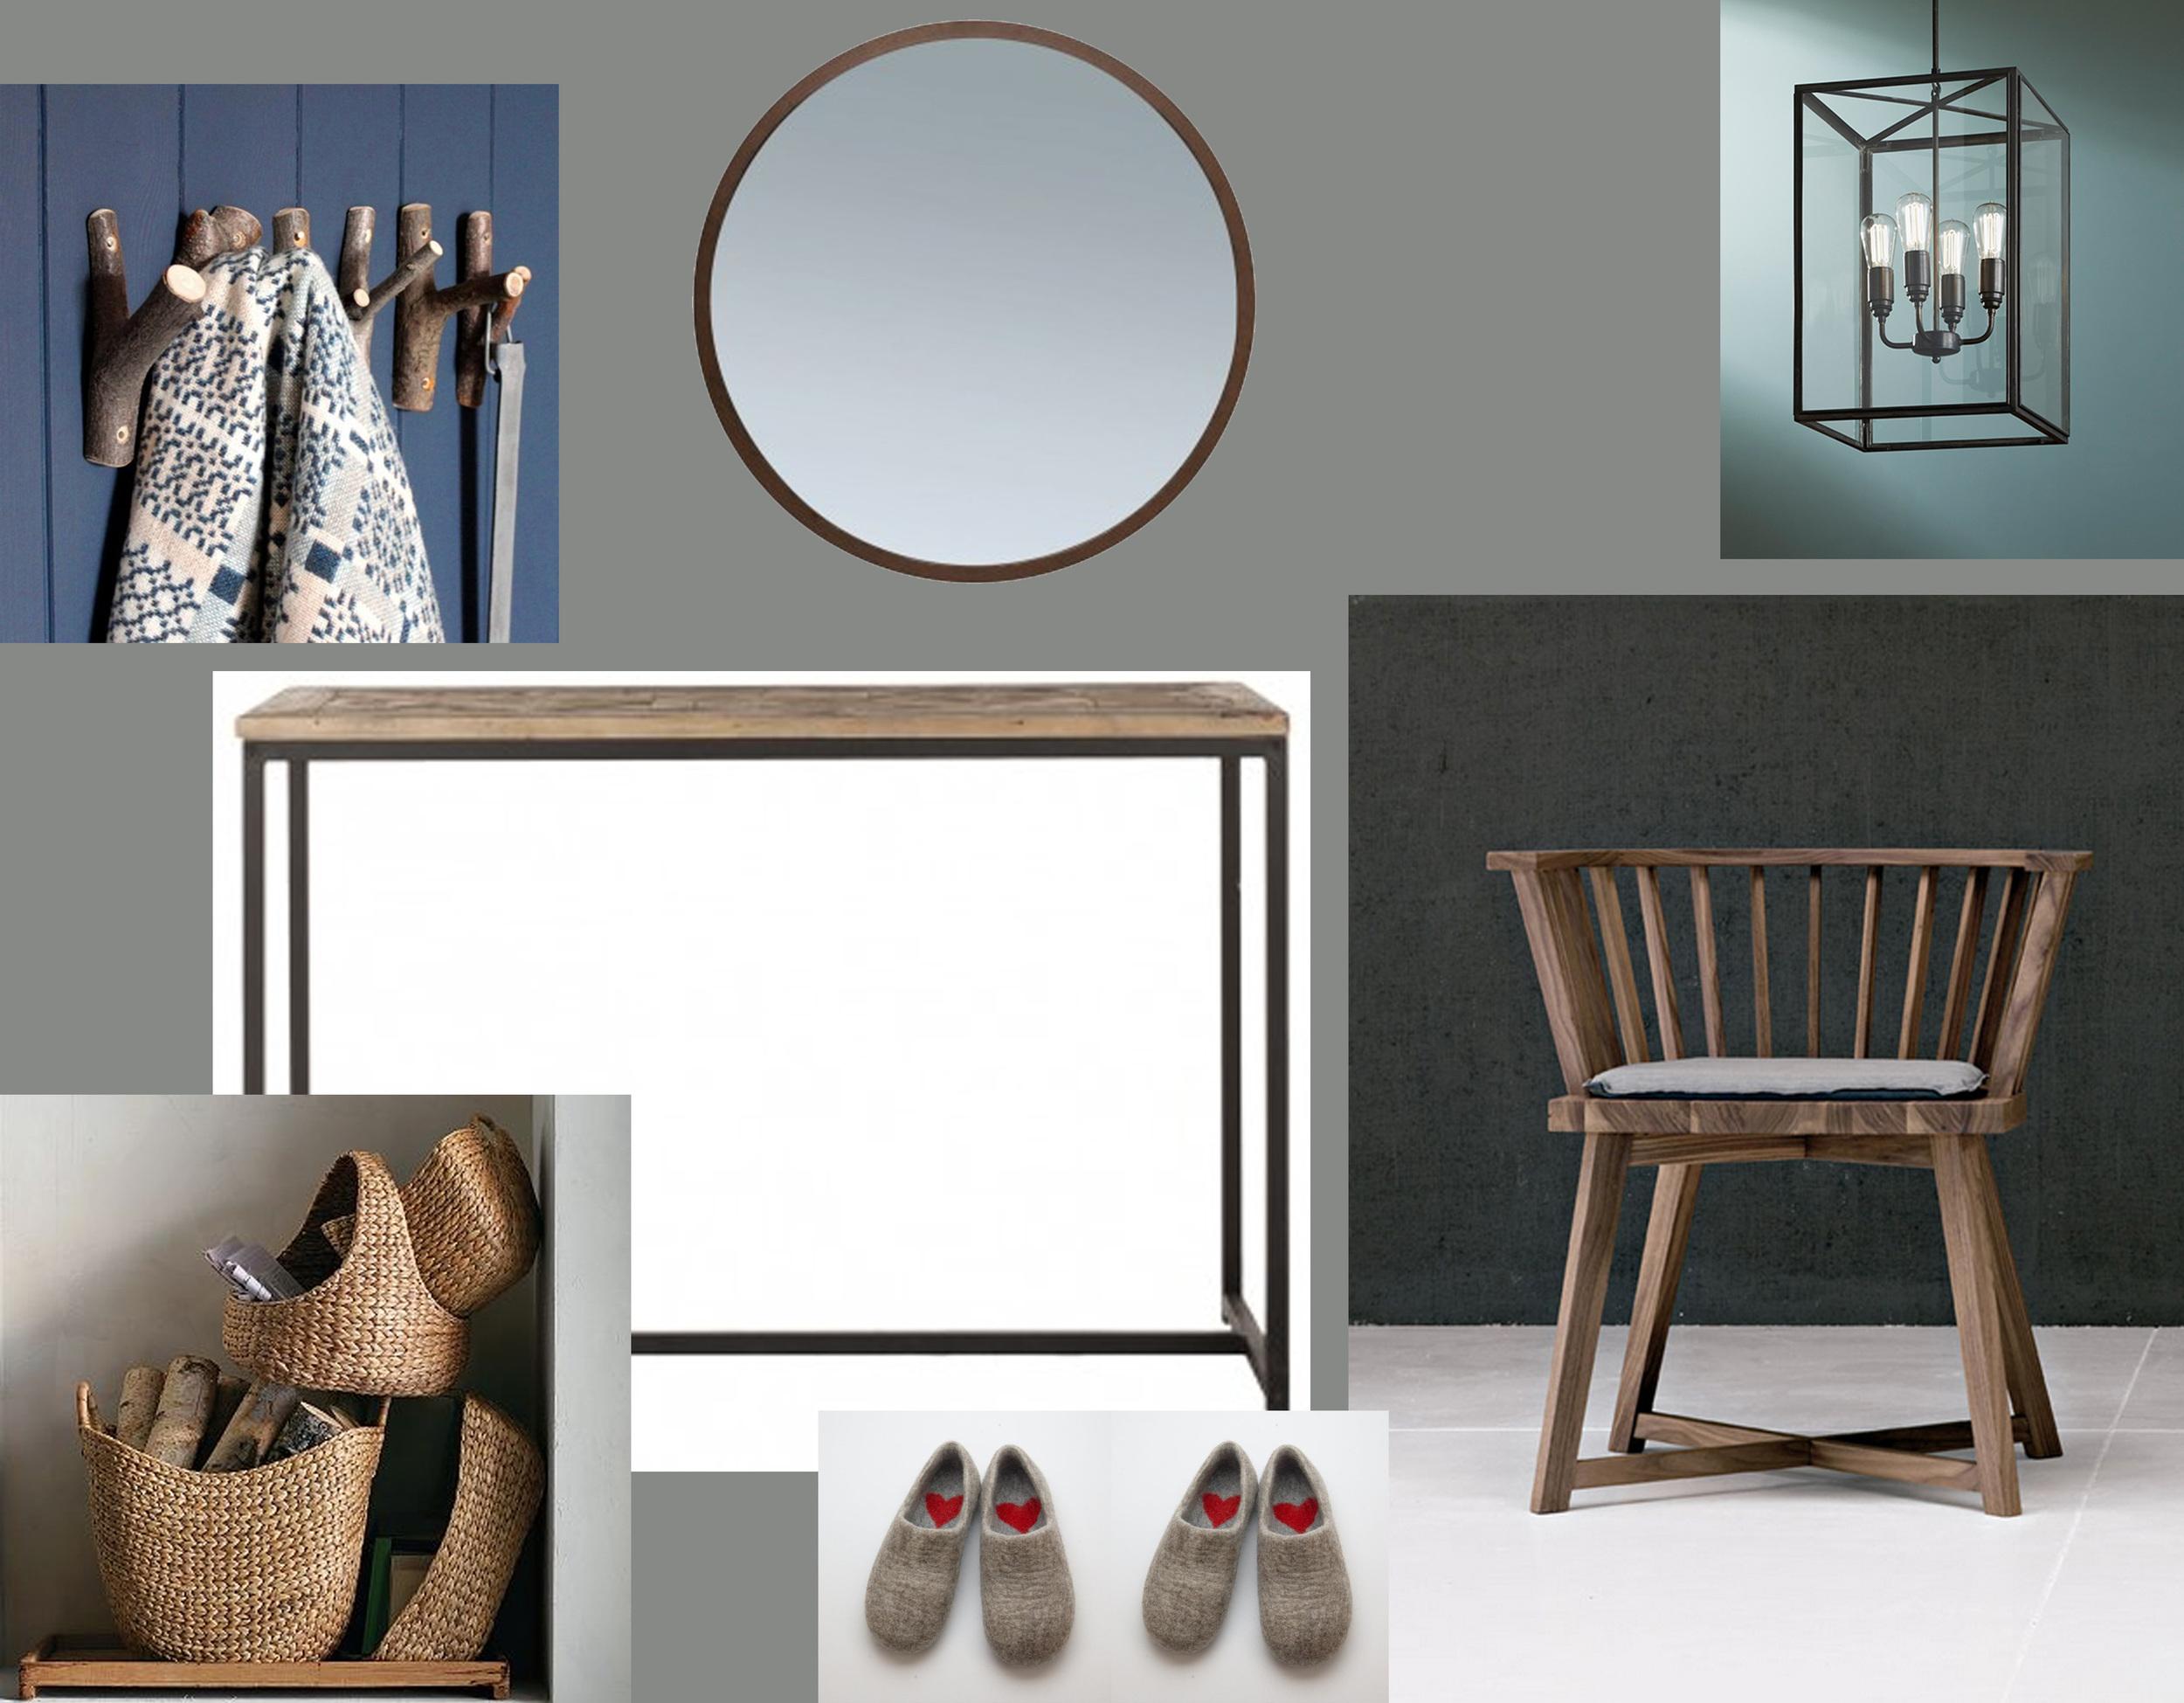 chair Gray 24  Gervasoni  - console Jules  Blanc d'Ivoire  - mirror Pelleas rond  Blanc d'Ivoire  - hanging lamp Ilford  Tekna  - Trook hooks  Rowen & Wren  - storage basket  West Elm  - felted clogs  Woolen Clogs